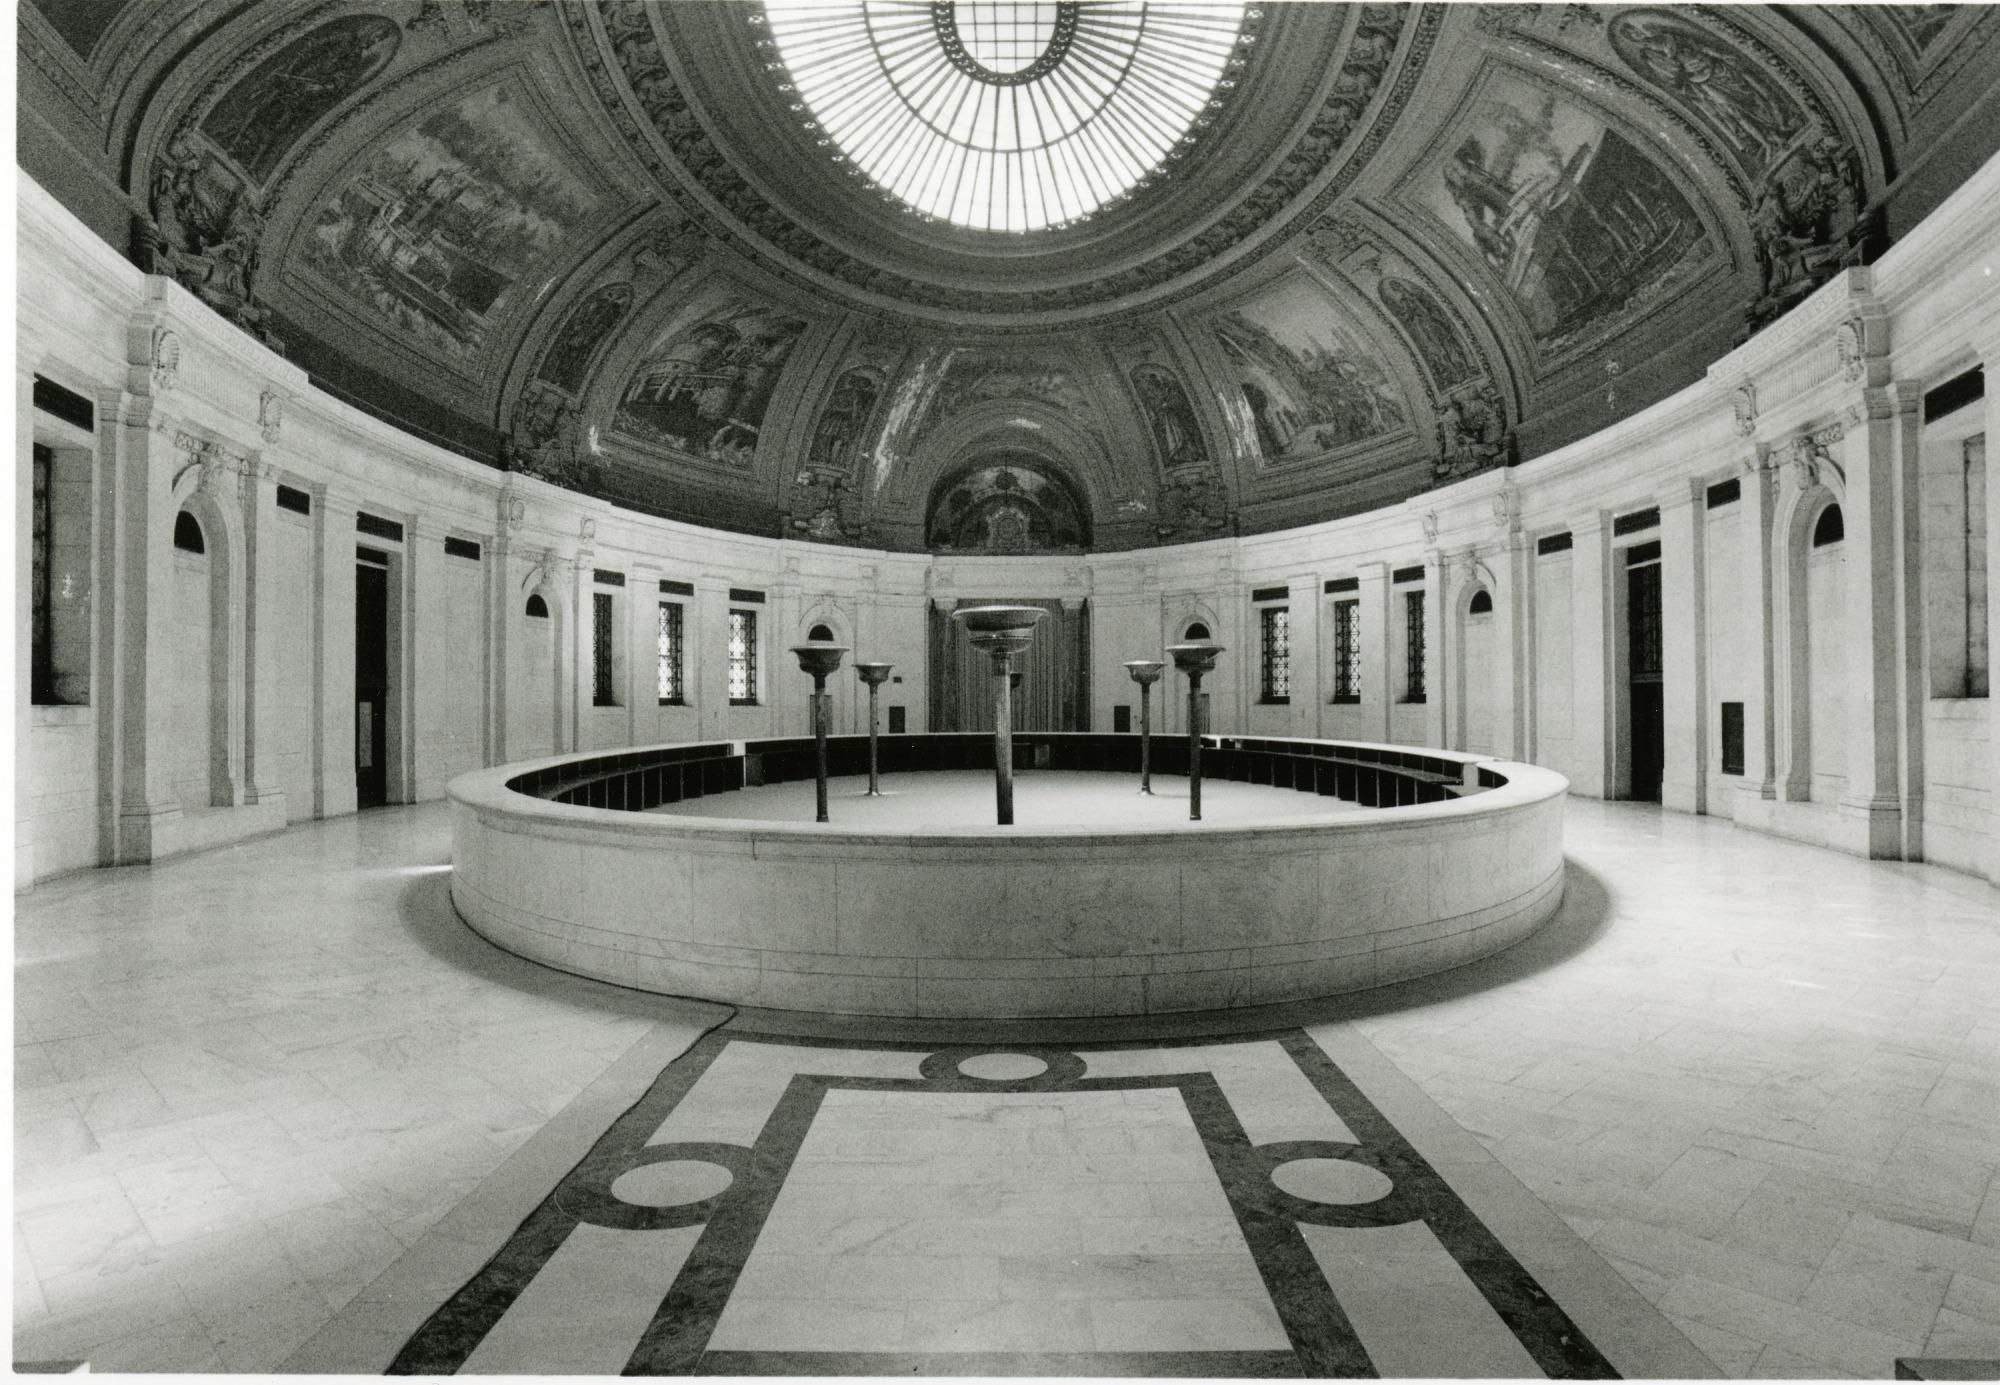 Interior of Alexander Hamilton Customs House with Fountain